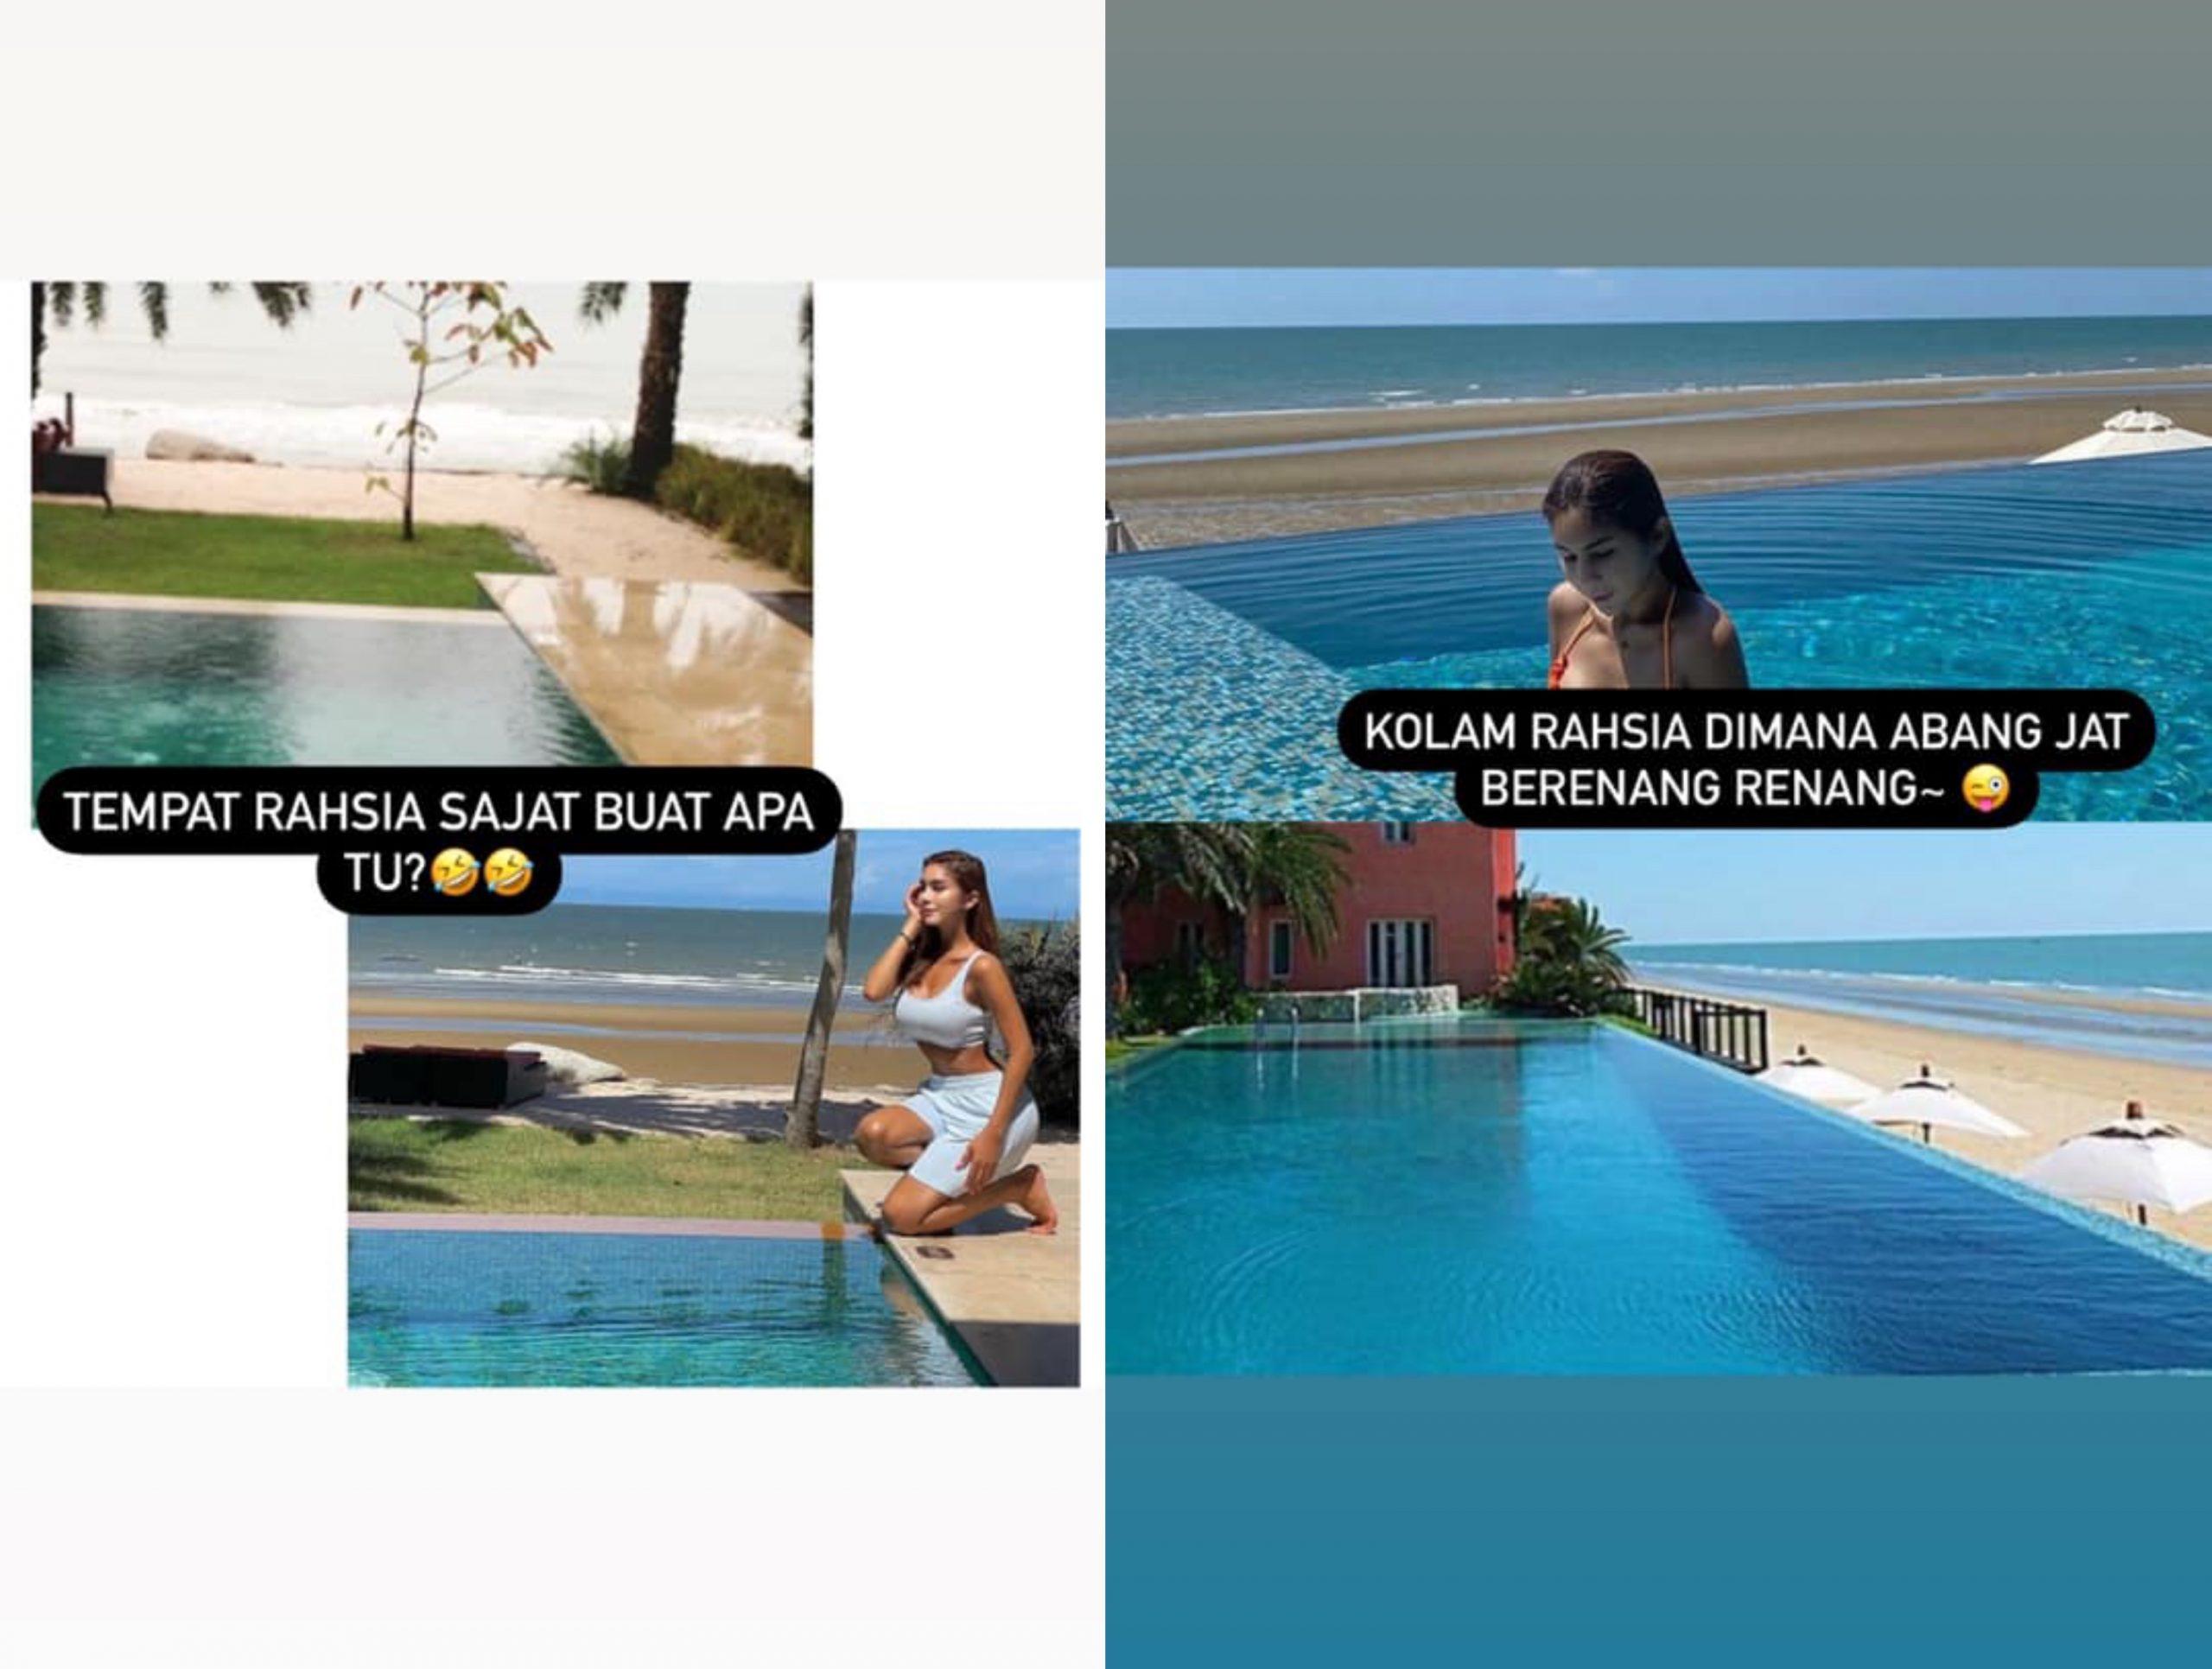 Kongsi Foto Tepi Pantai, Netizen Siasat Lokasi 'Rahsia' Sajat. Sebijik Macam Hotel Dekat… 10